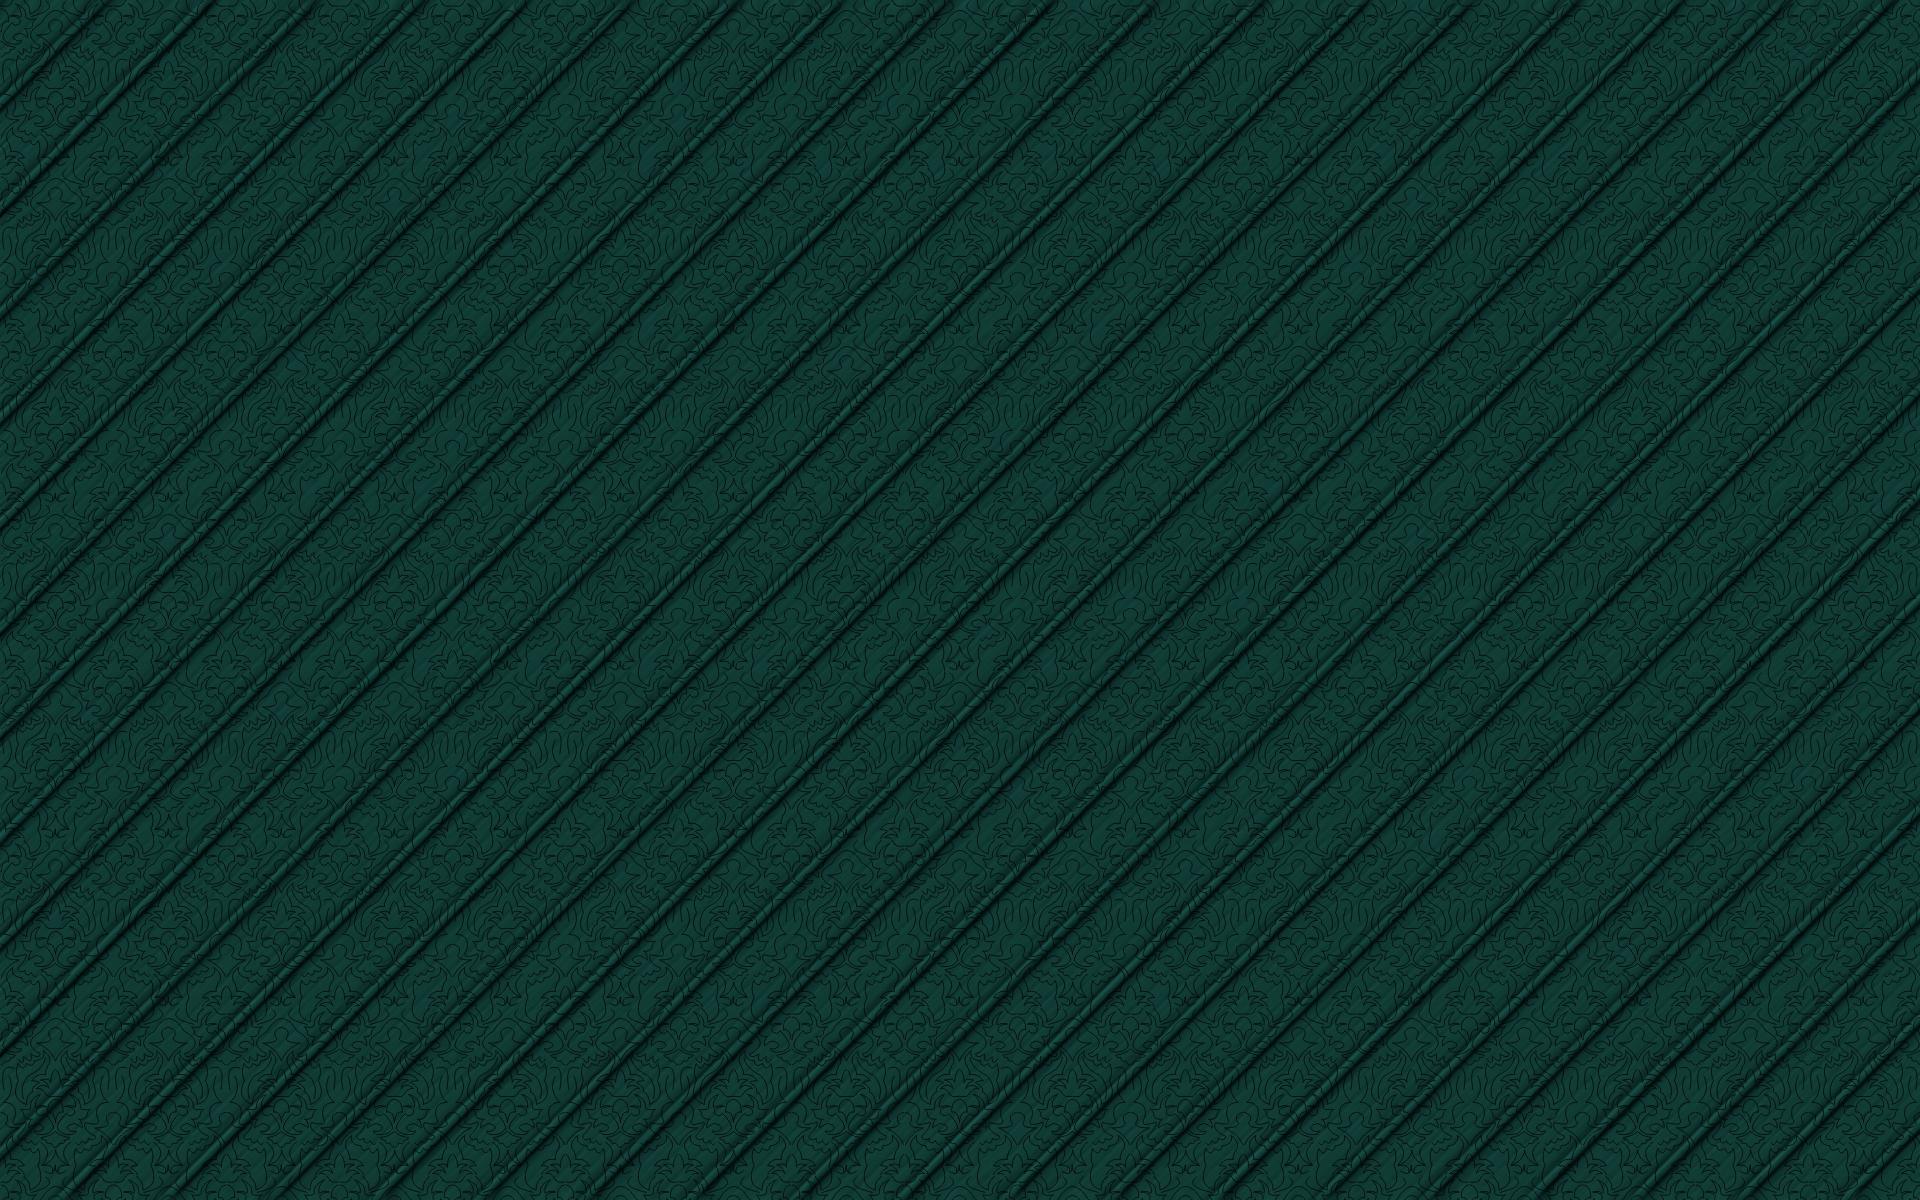 [Resim: lines_texture110031uay.jpg]